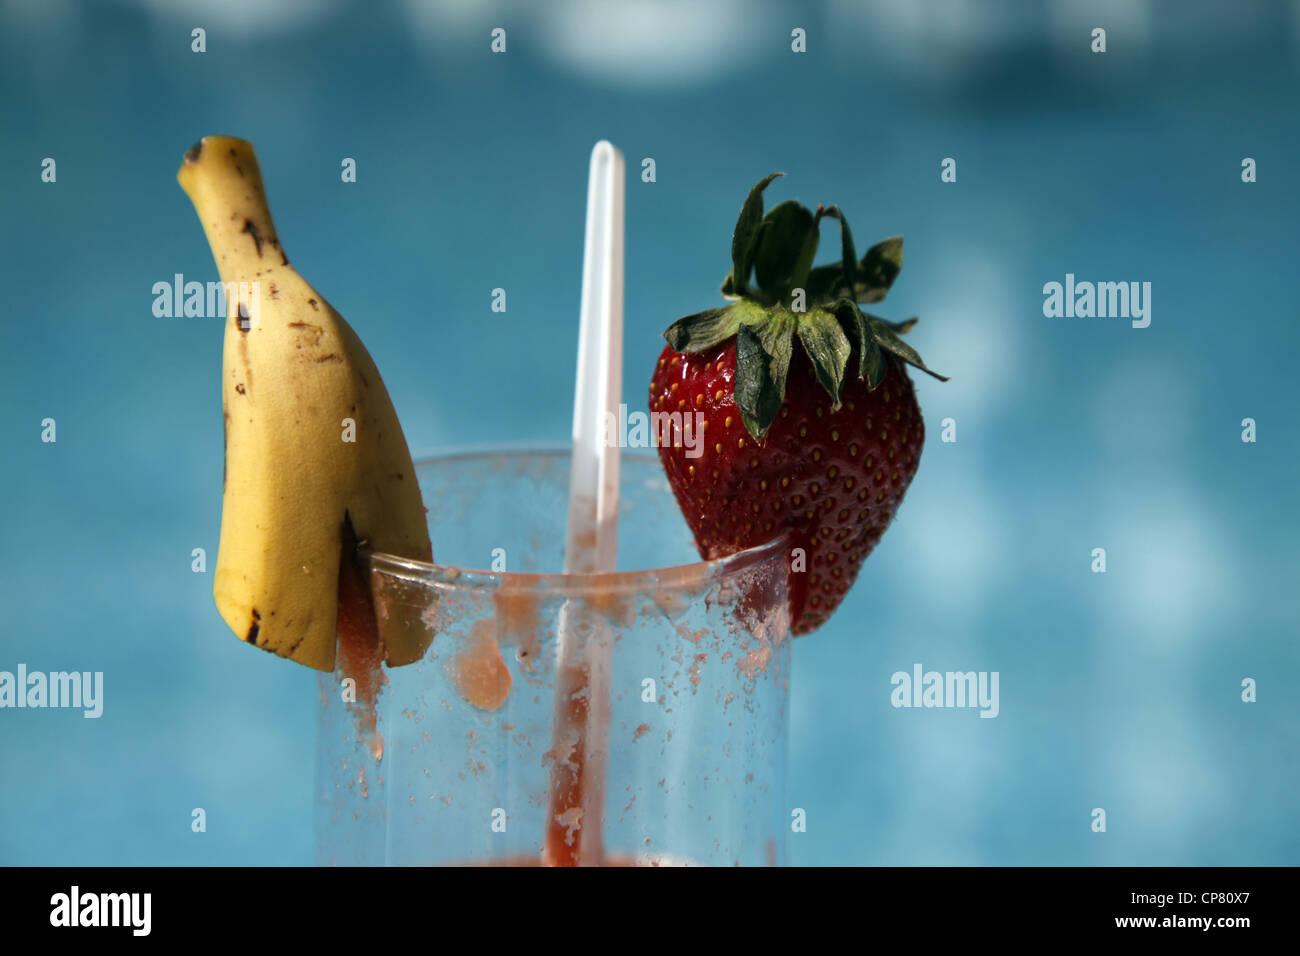 BANANA & STRAWBERRY ON GLASS SIDE TURKEY 15 April 2012 - Stock Image